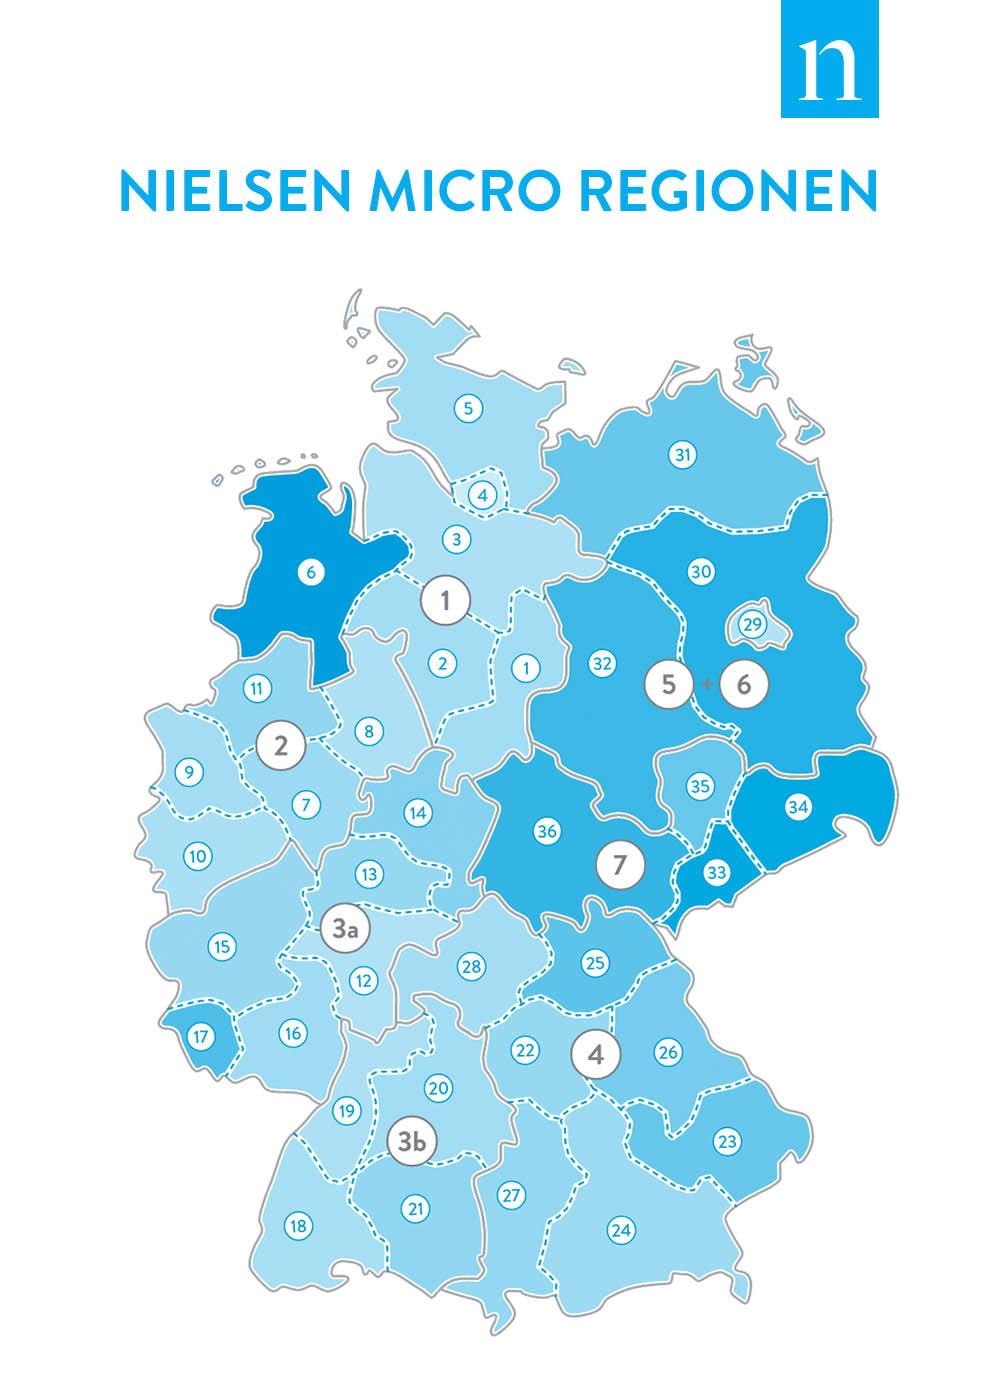 Nielsen Micro Regionen